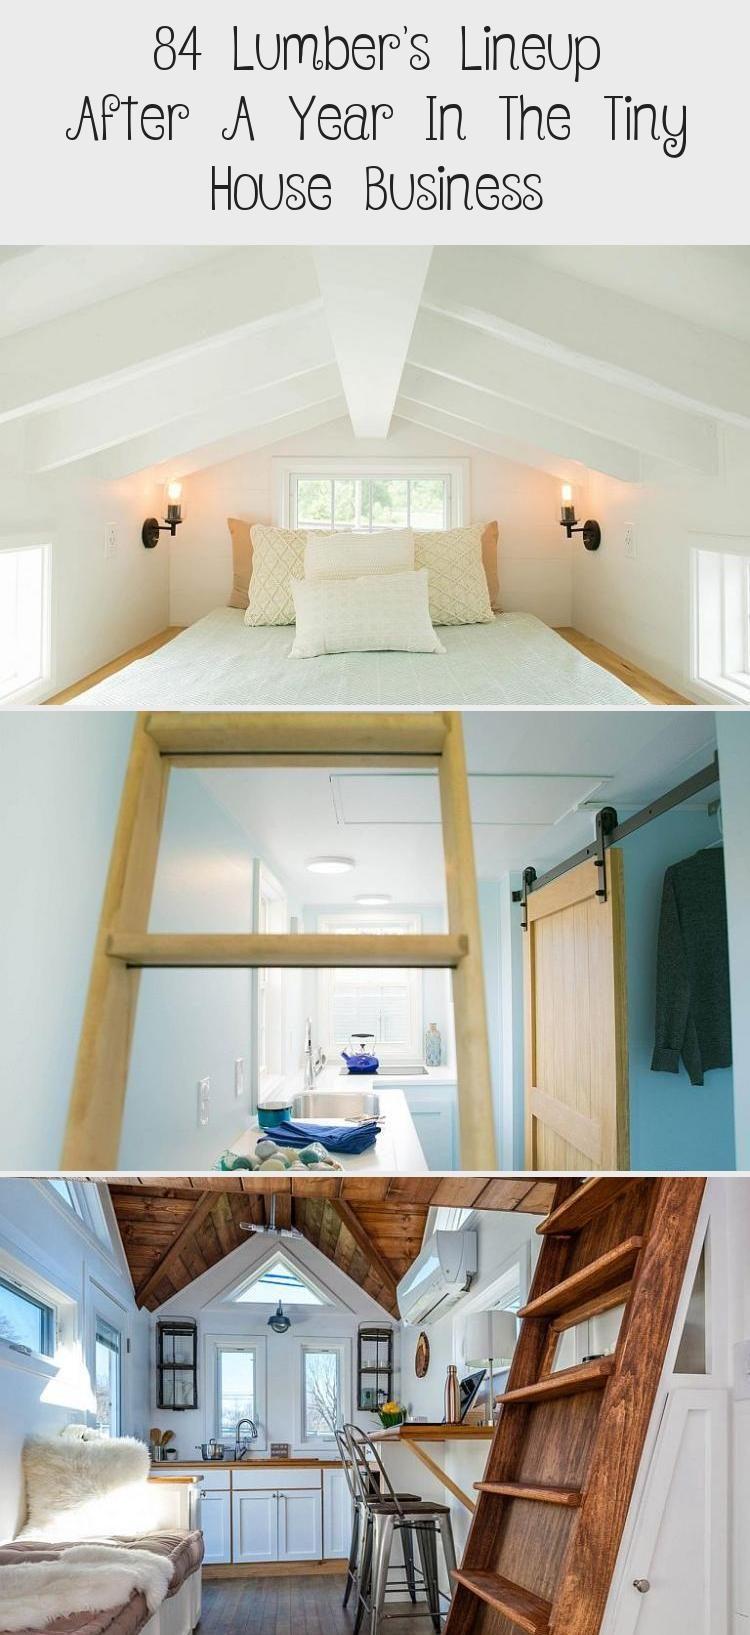 My Blog In 2020 Cheap Diy Tiny House House